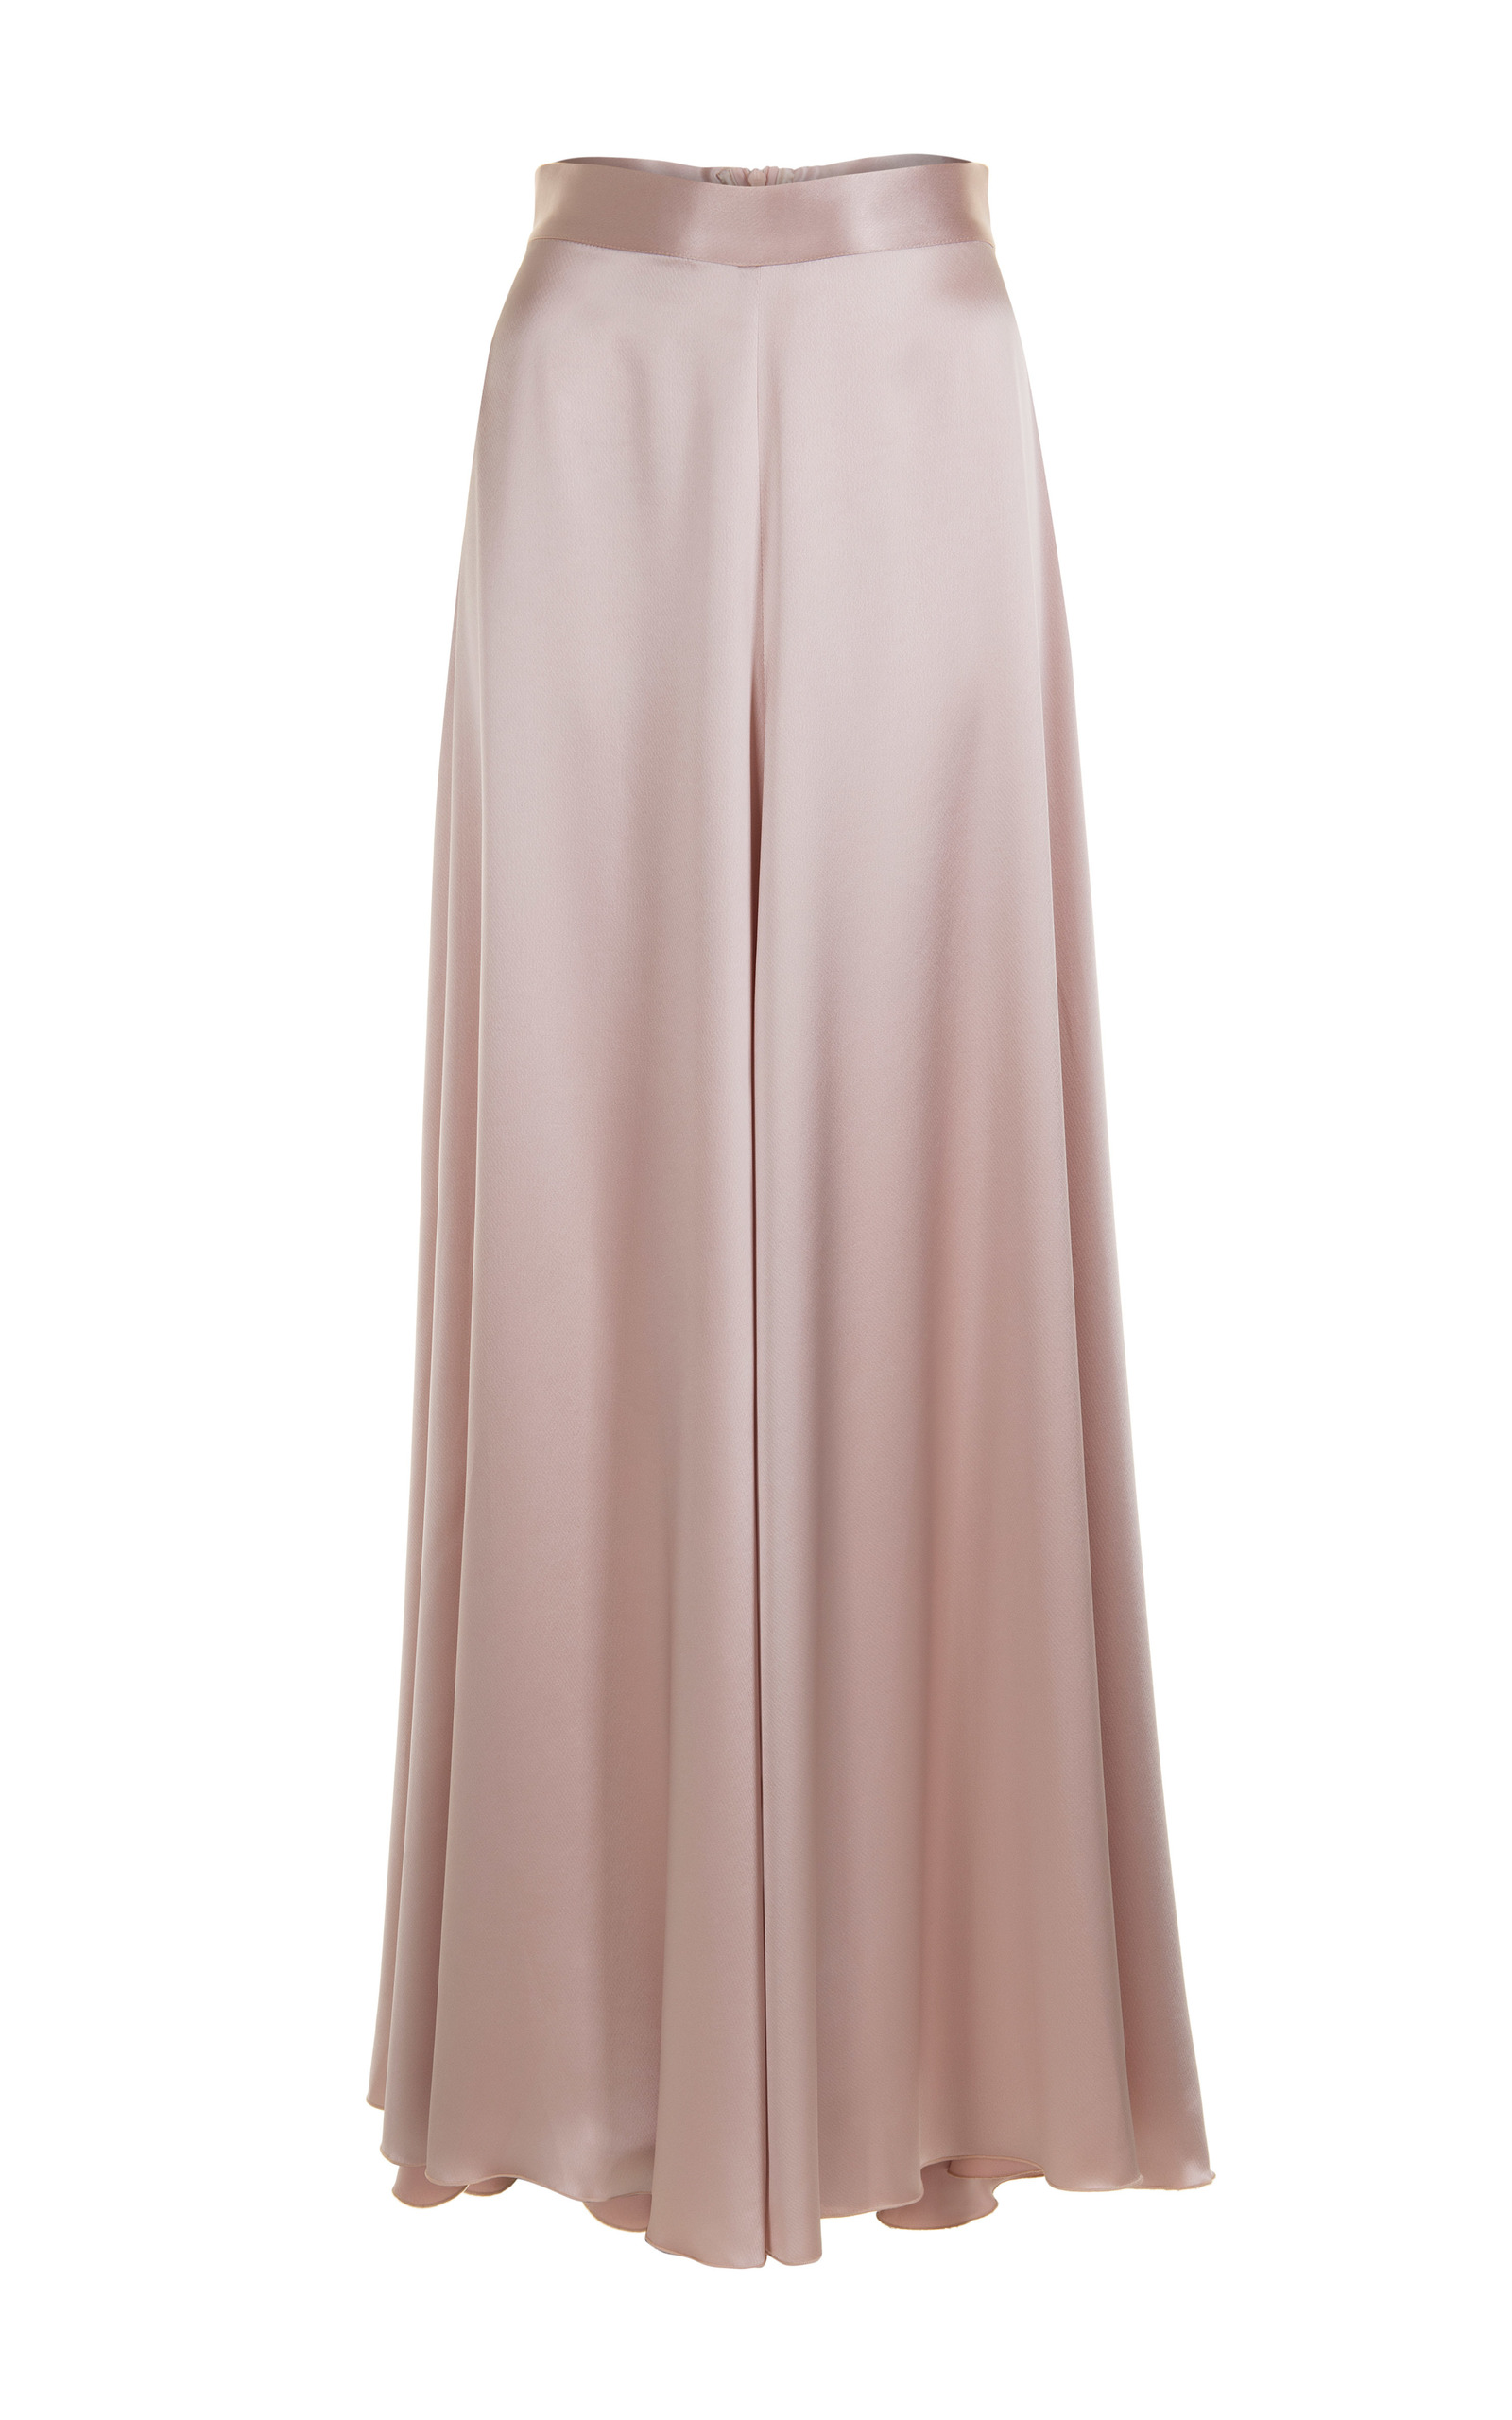 6c43bf6fc868 Loose Satin Maxi Skirt by Jessica Choay | Moda Operandi